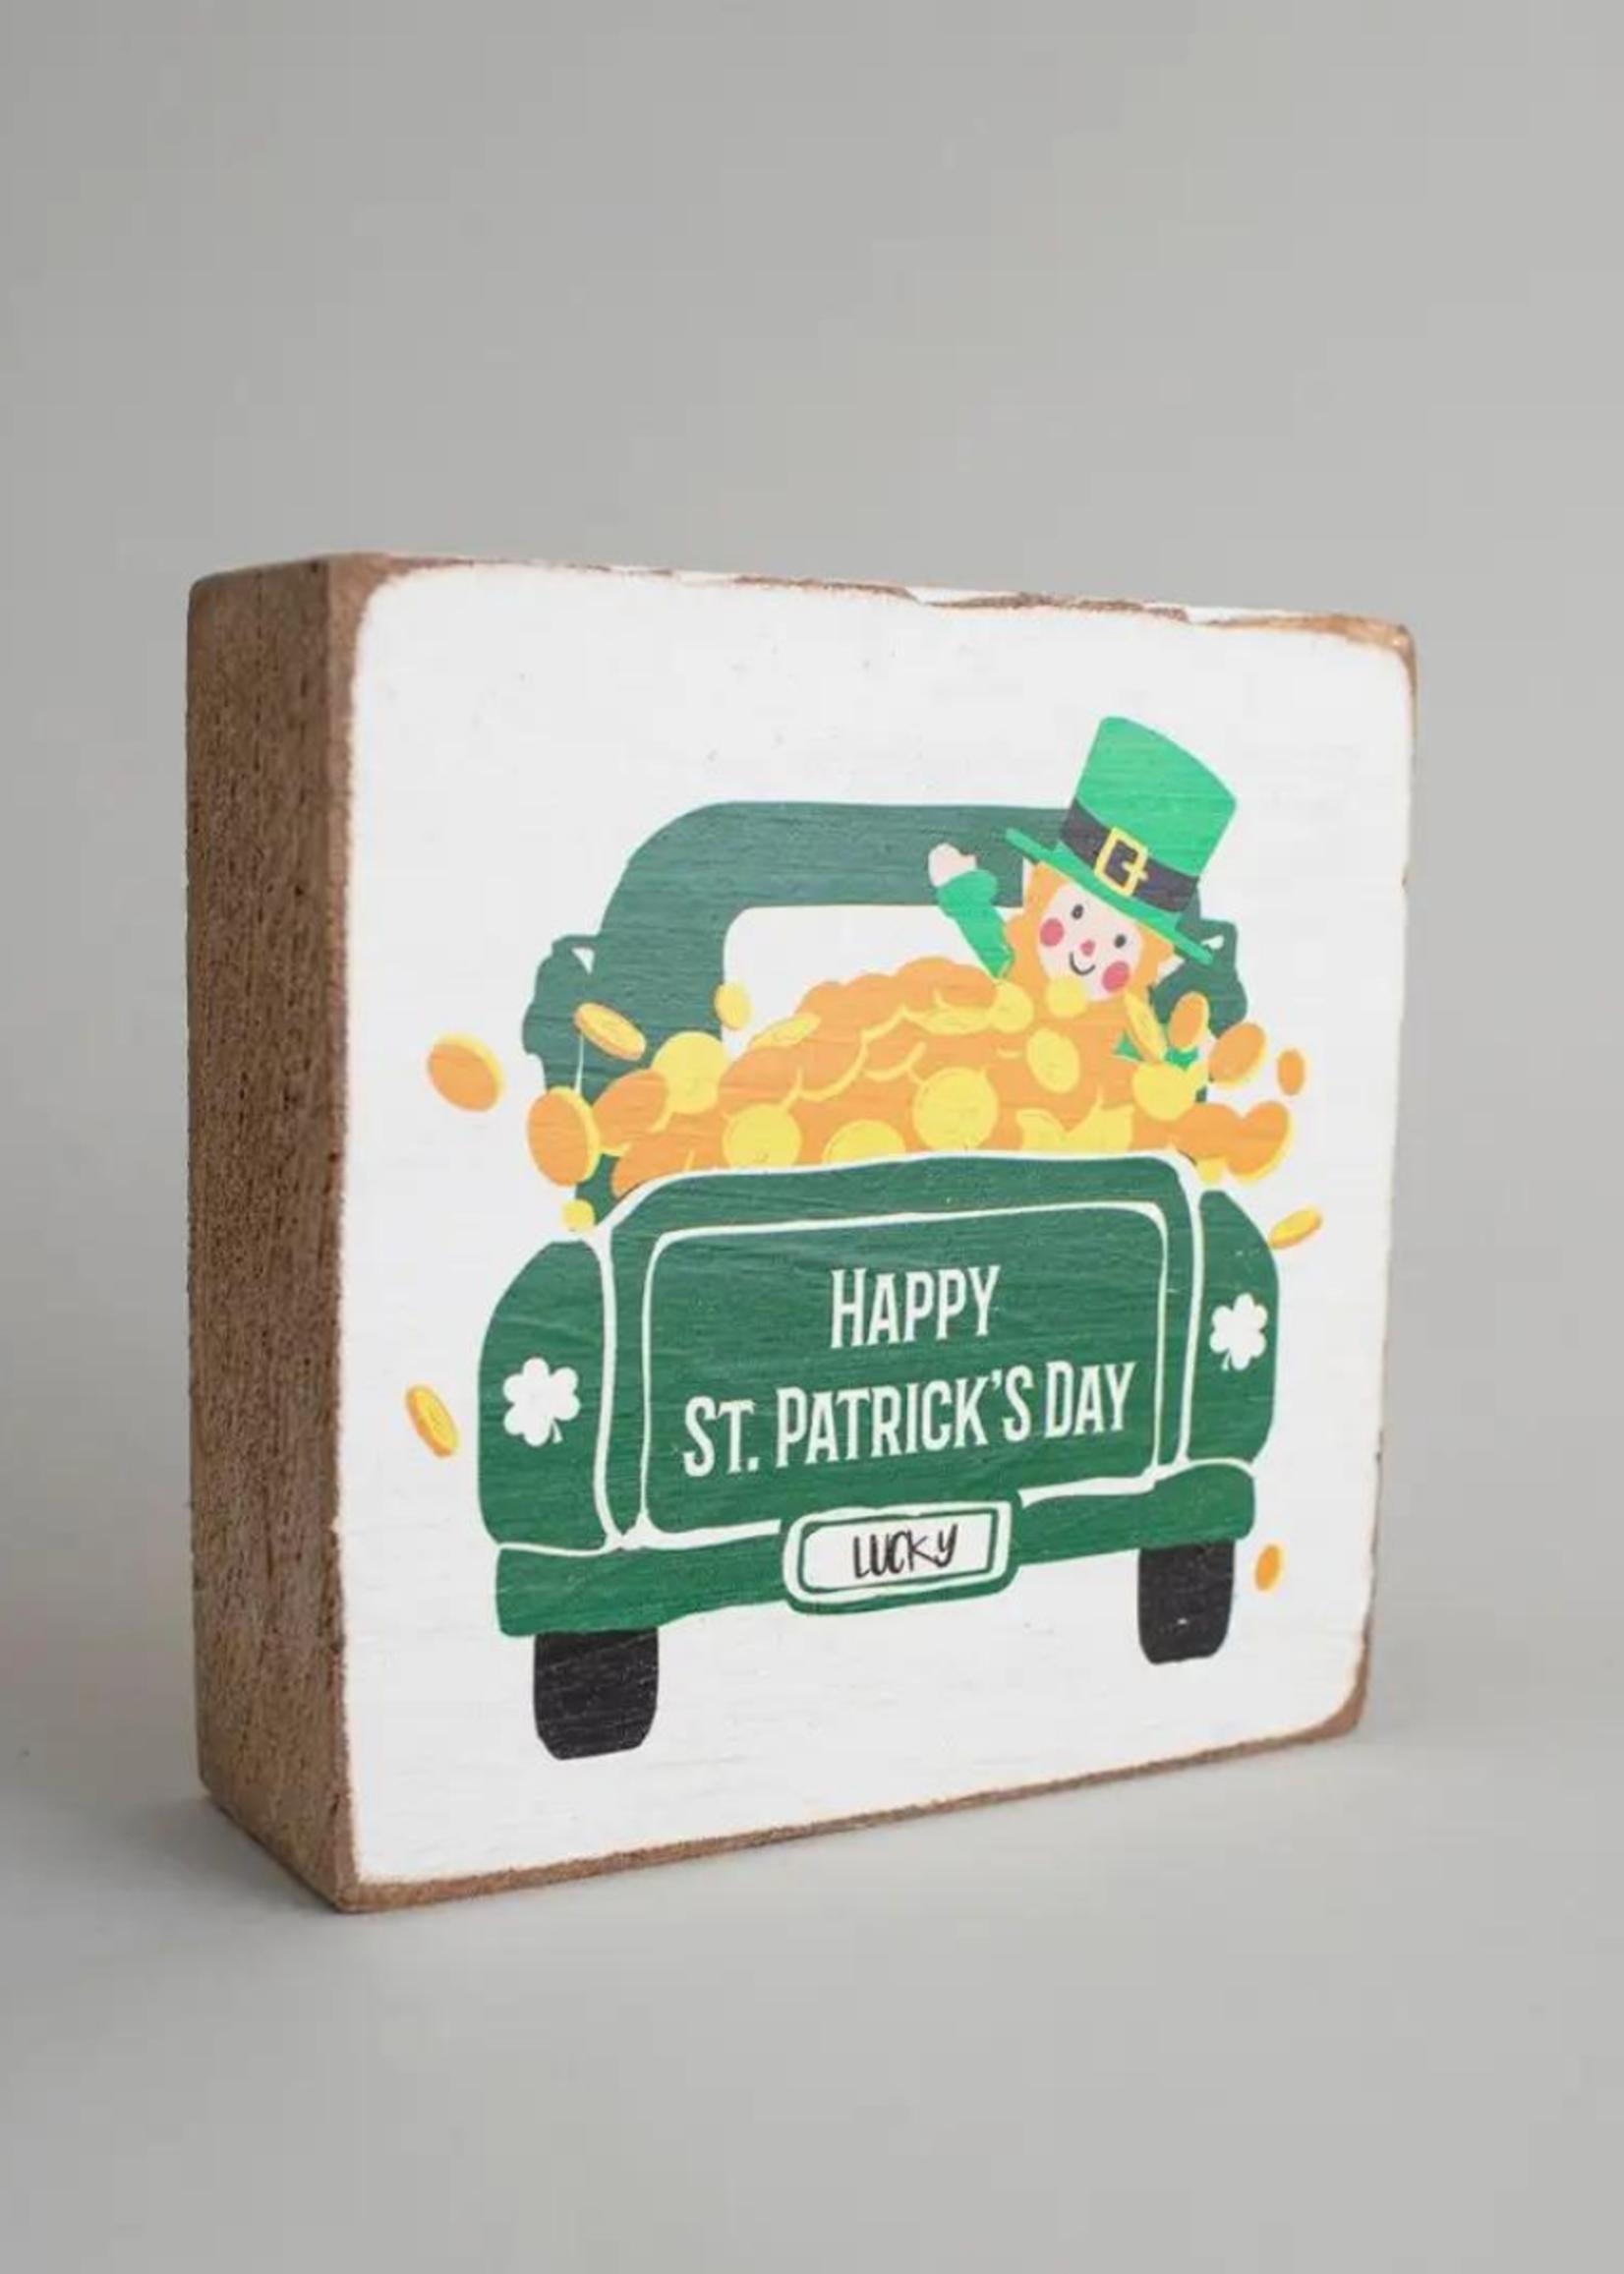 Rustic Marlin Happy St. Patrick's Day Truck Decorative Wooden Block